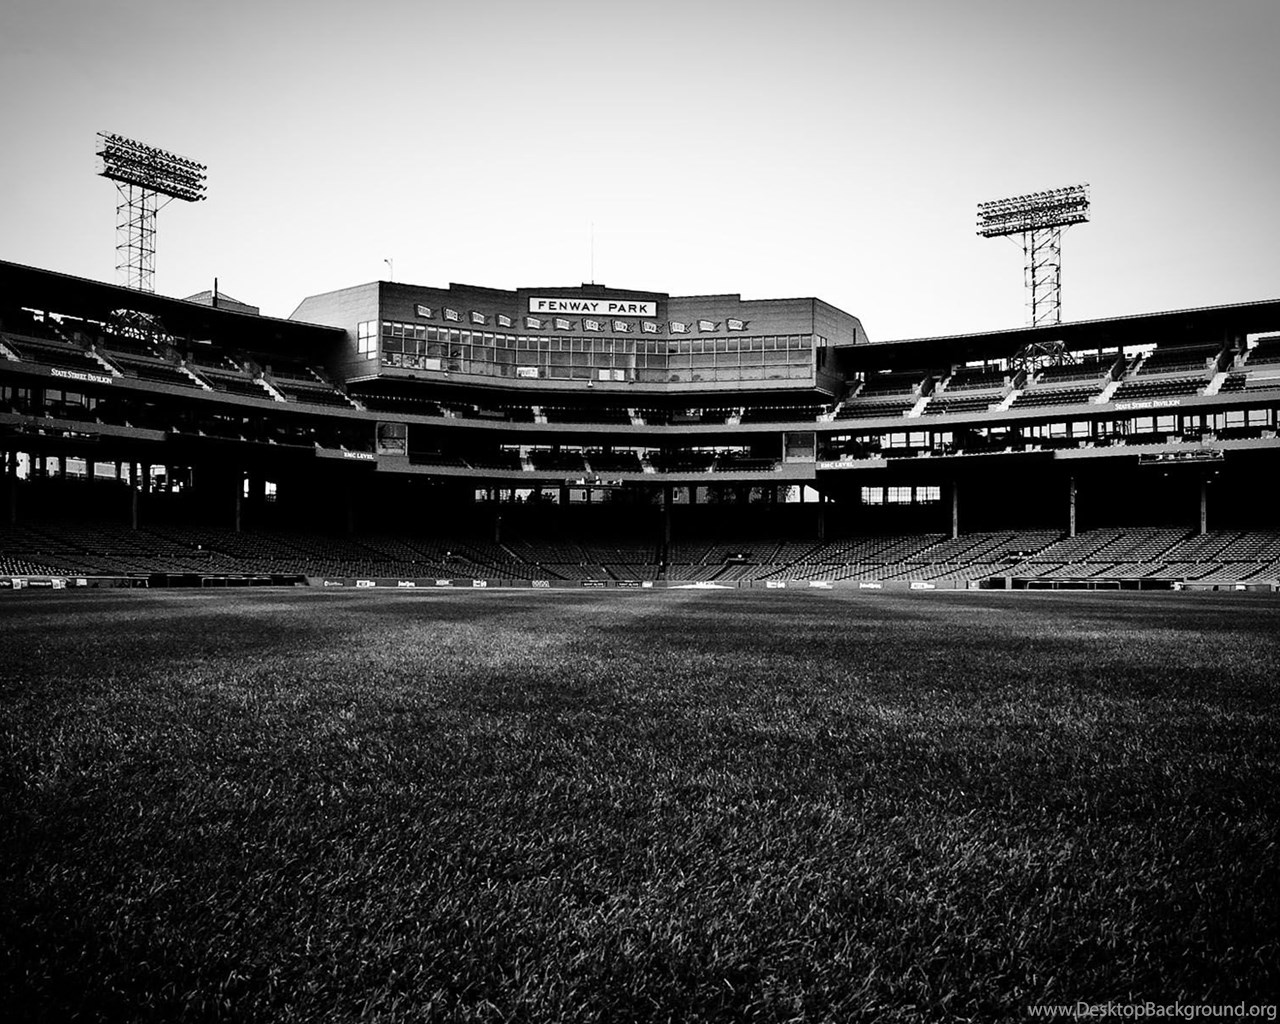 Boston Red Sox Fenway Park 1920x1200 Wallpaper Desktop Background